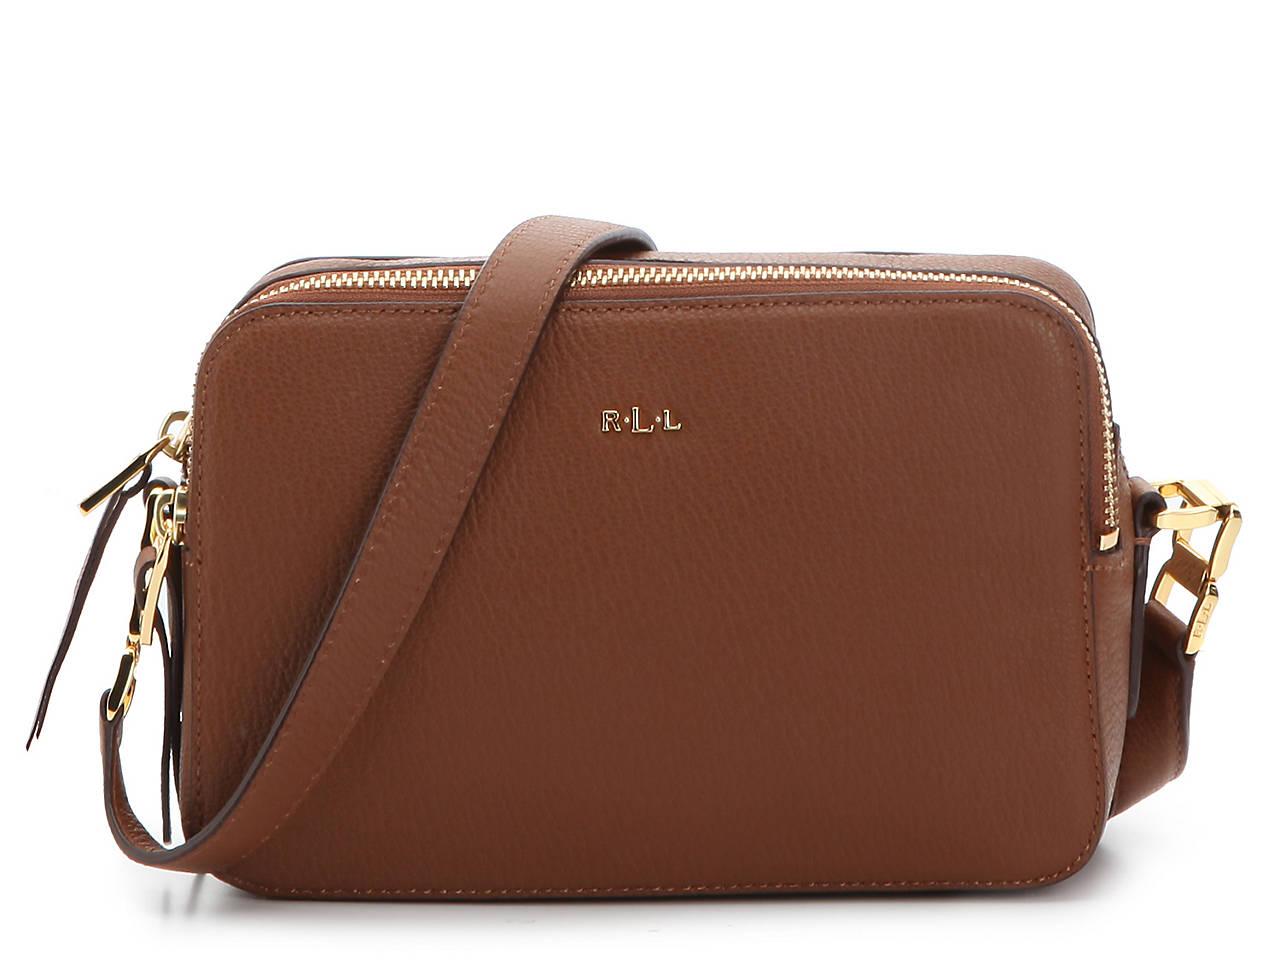 aa12c983815e Lauren Ralph Lauren Rawson Celeste Leather Crossbody Bag Women's ...